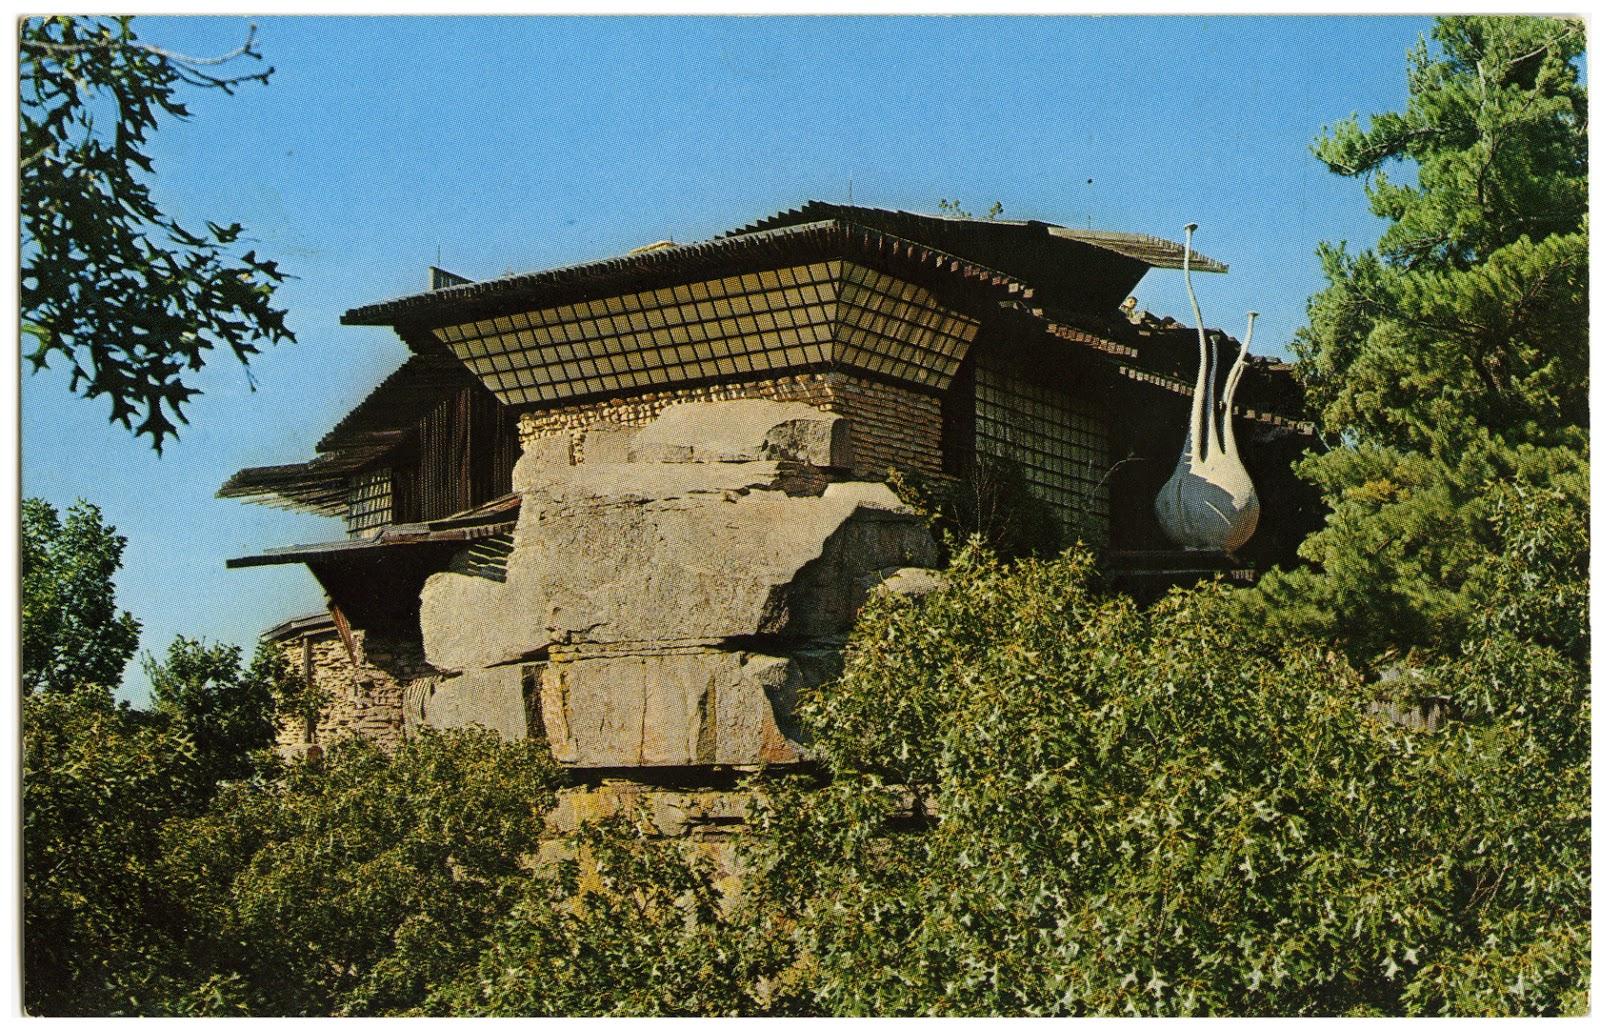 The House on the Rock, Jordan's former retreat house.